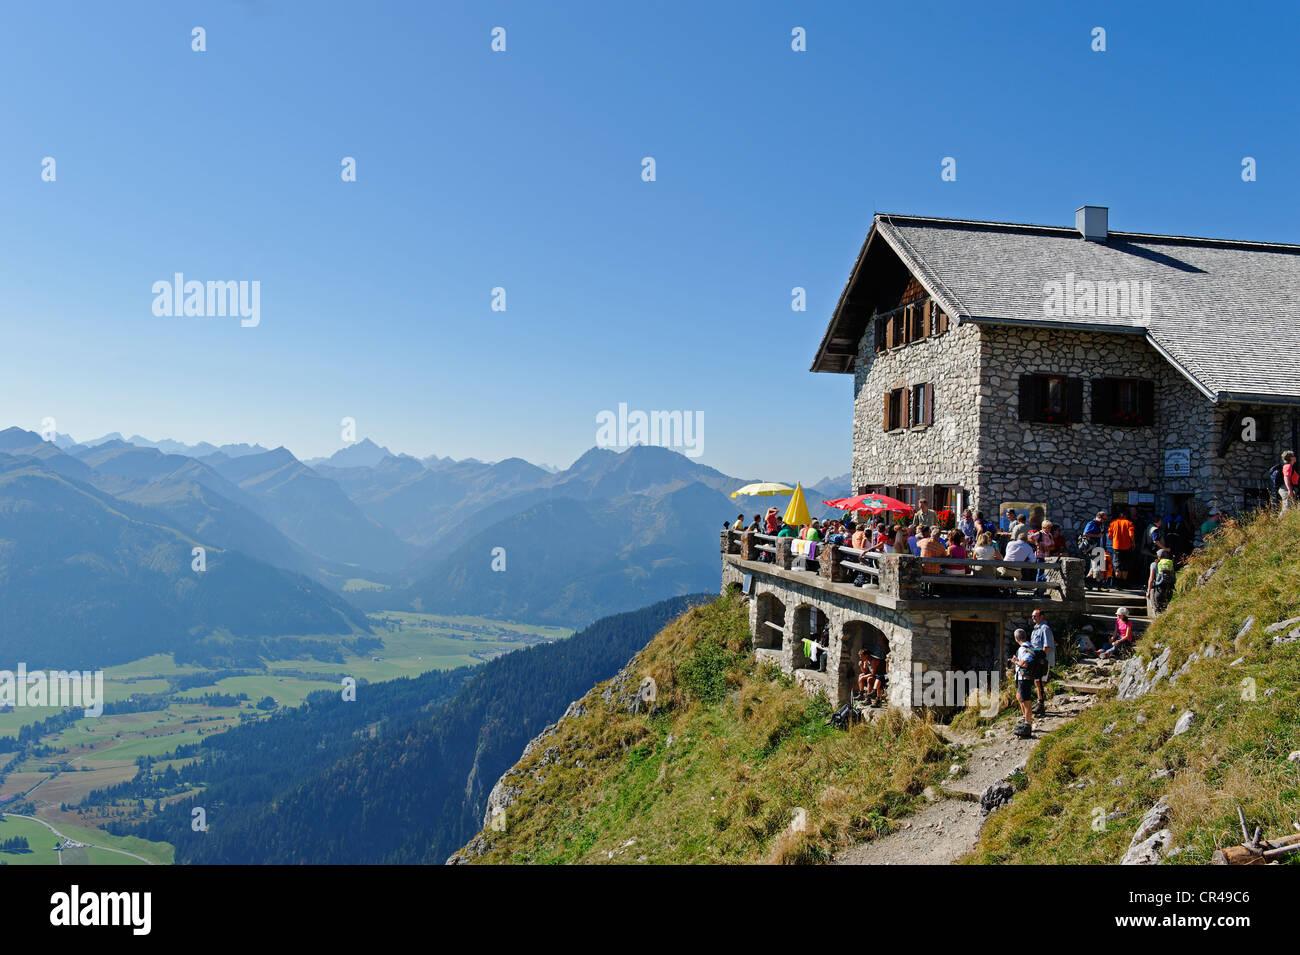 Bad Kissinger Huette mountain lodge on Mt. Aggenstein, Bavarian Swabia, Bavaria, Germany, Europe - Stock Image